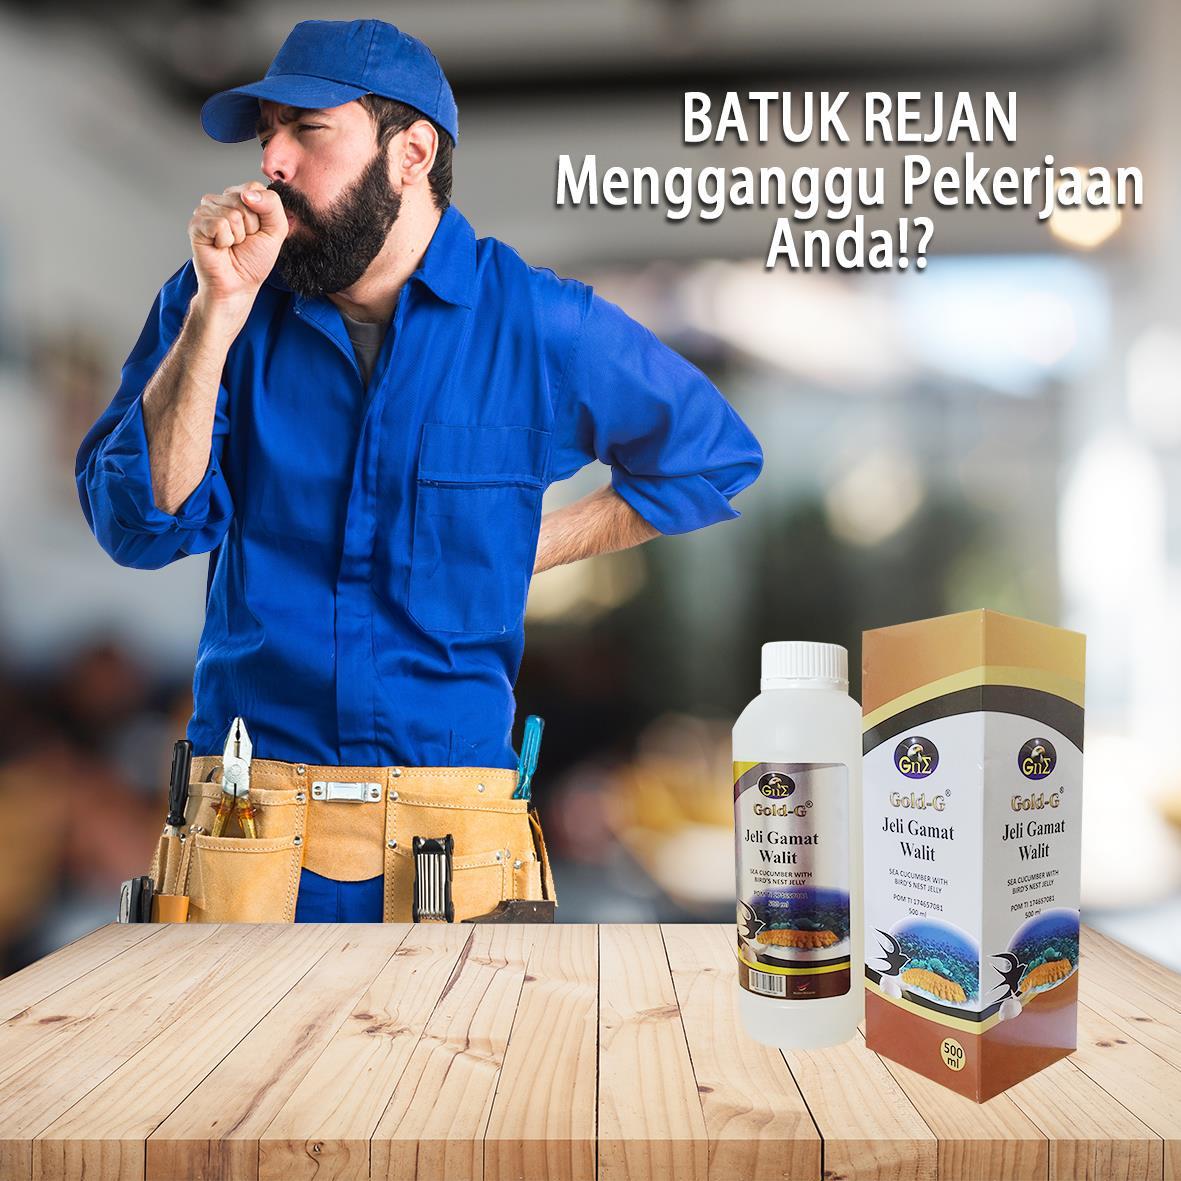 Obat Batuk Rejan Ampuh Jelly Gamat Walet